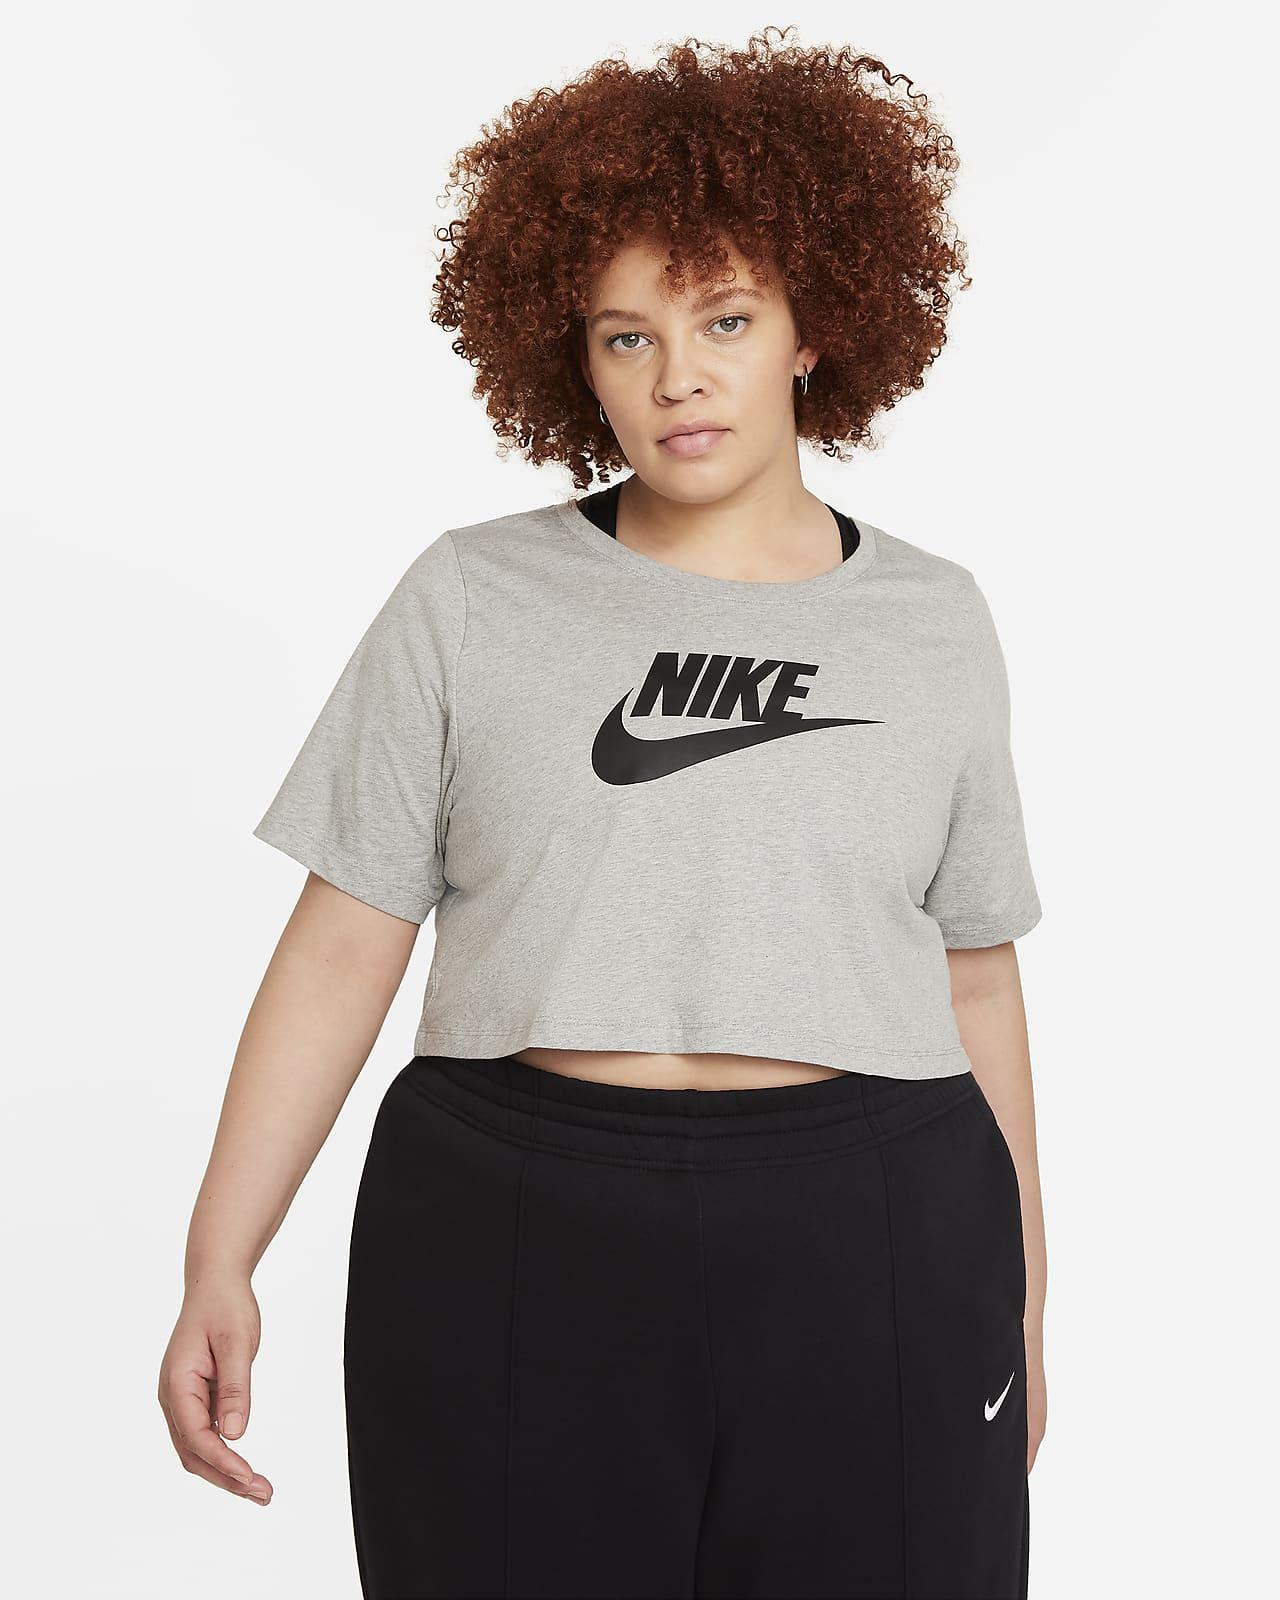 Playera para mujer (talla grande) Nike Sportswear